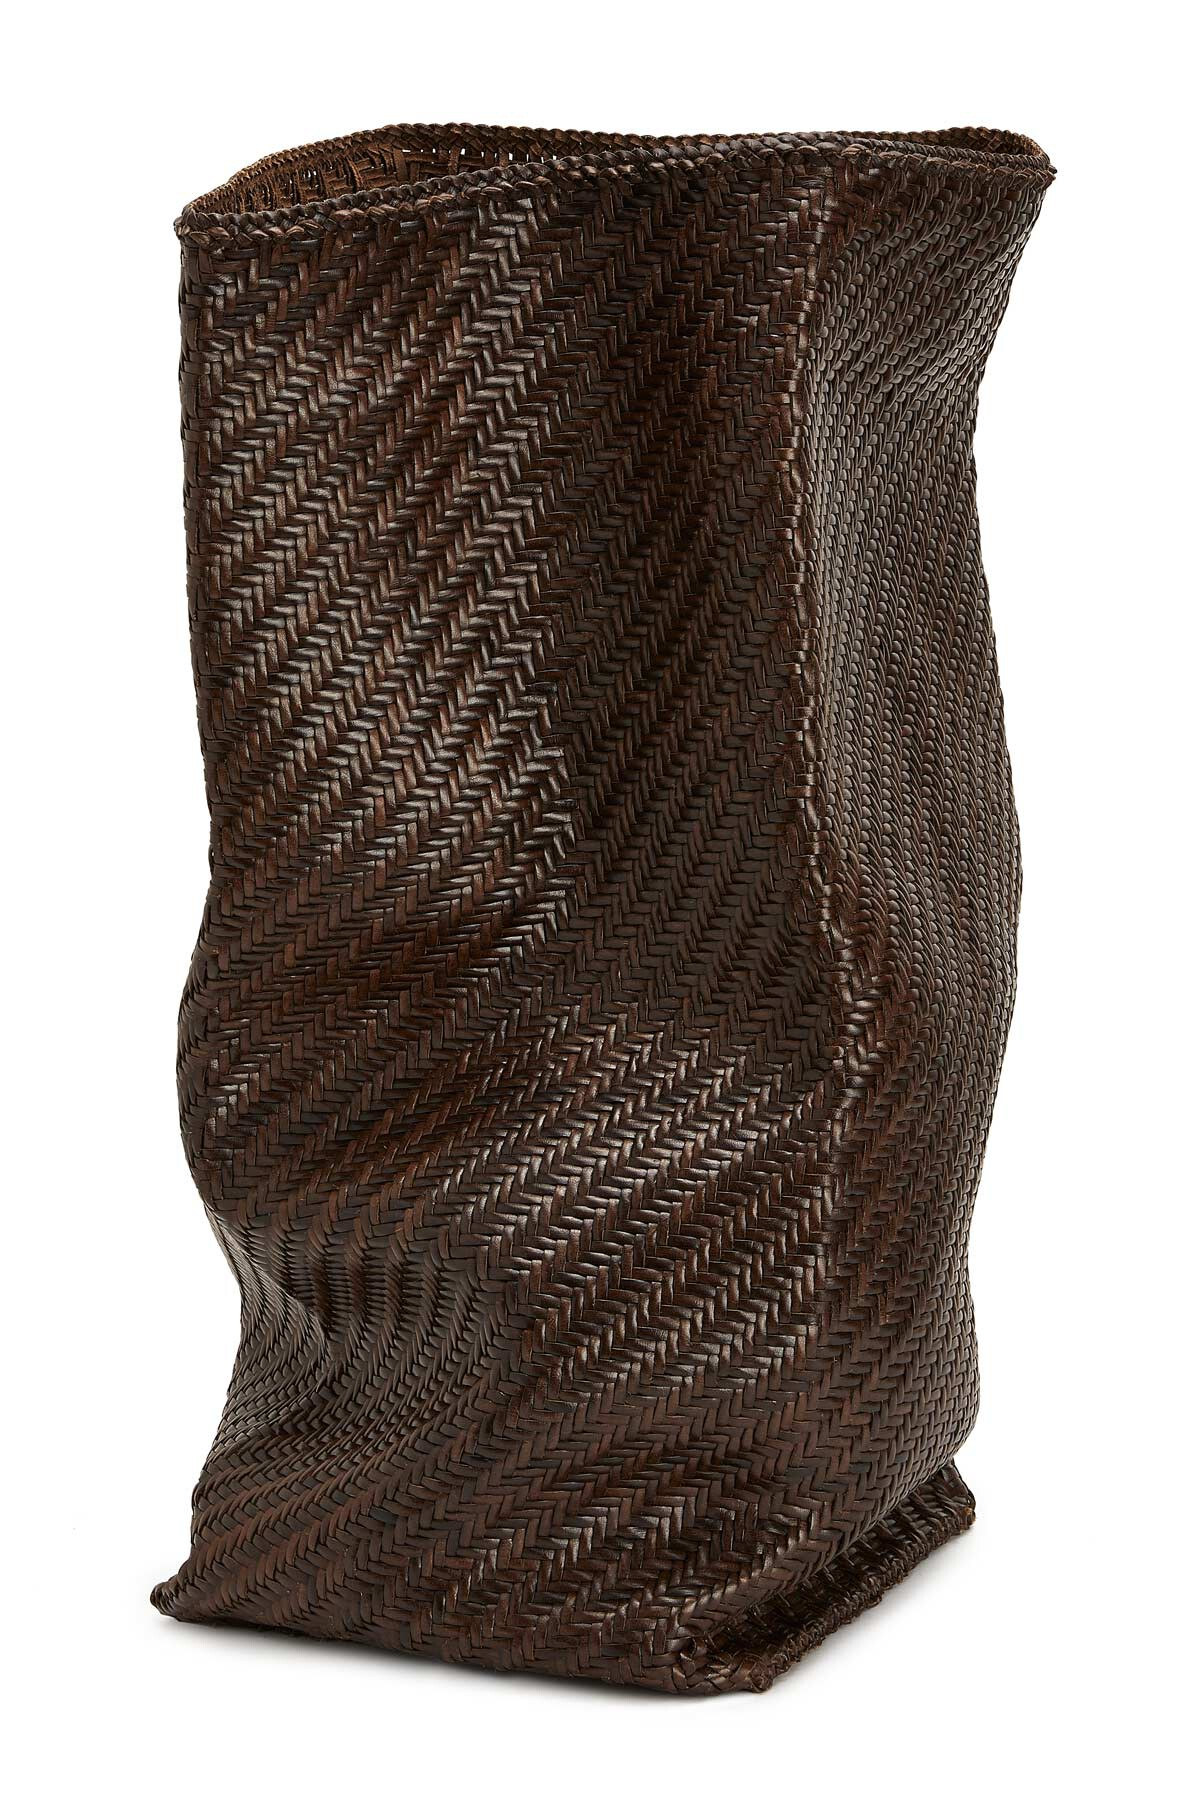 LOEWE 柔软廓型编织手袋 栗棕色 front